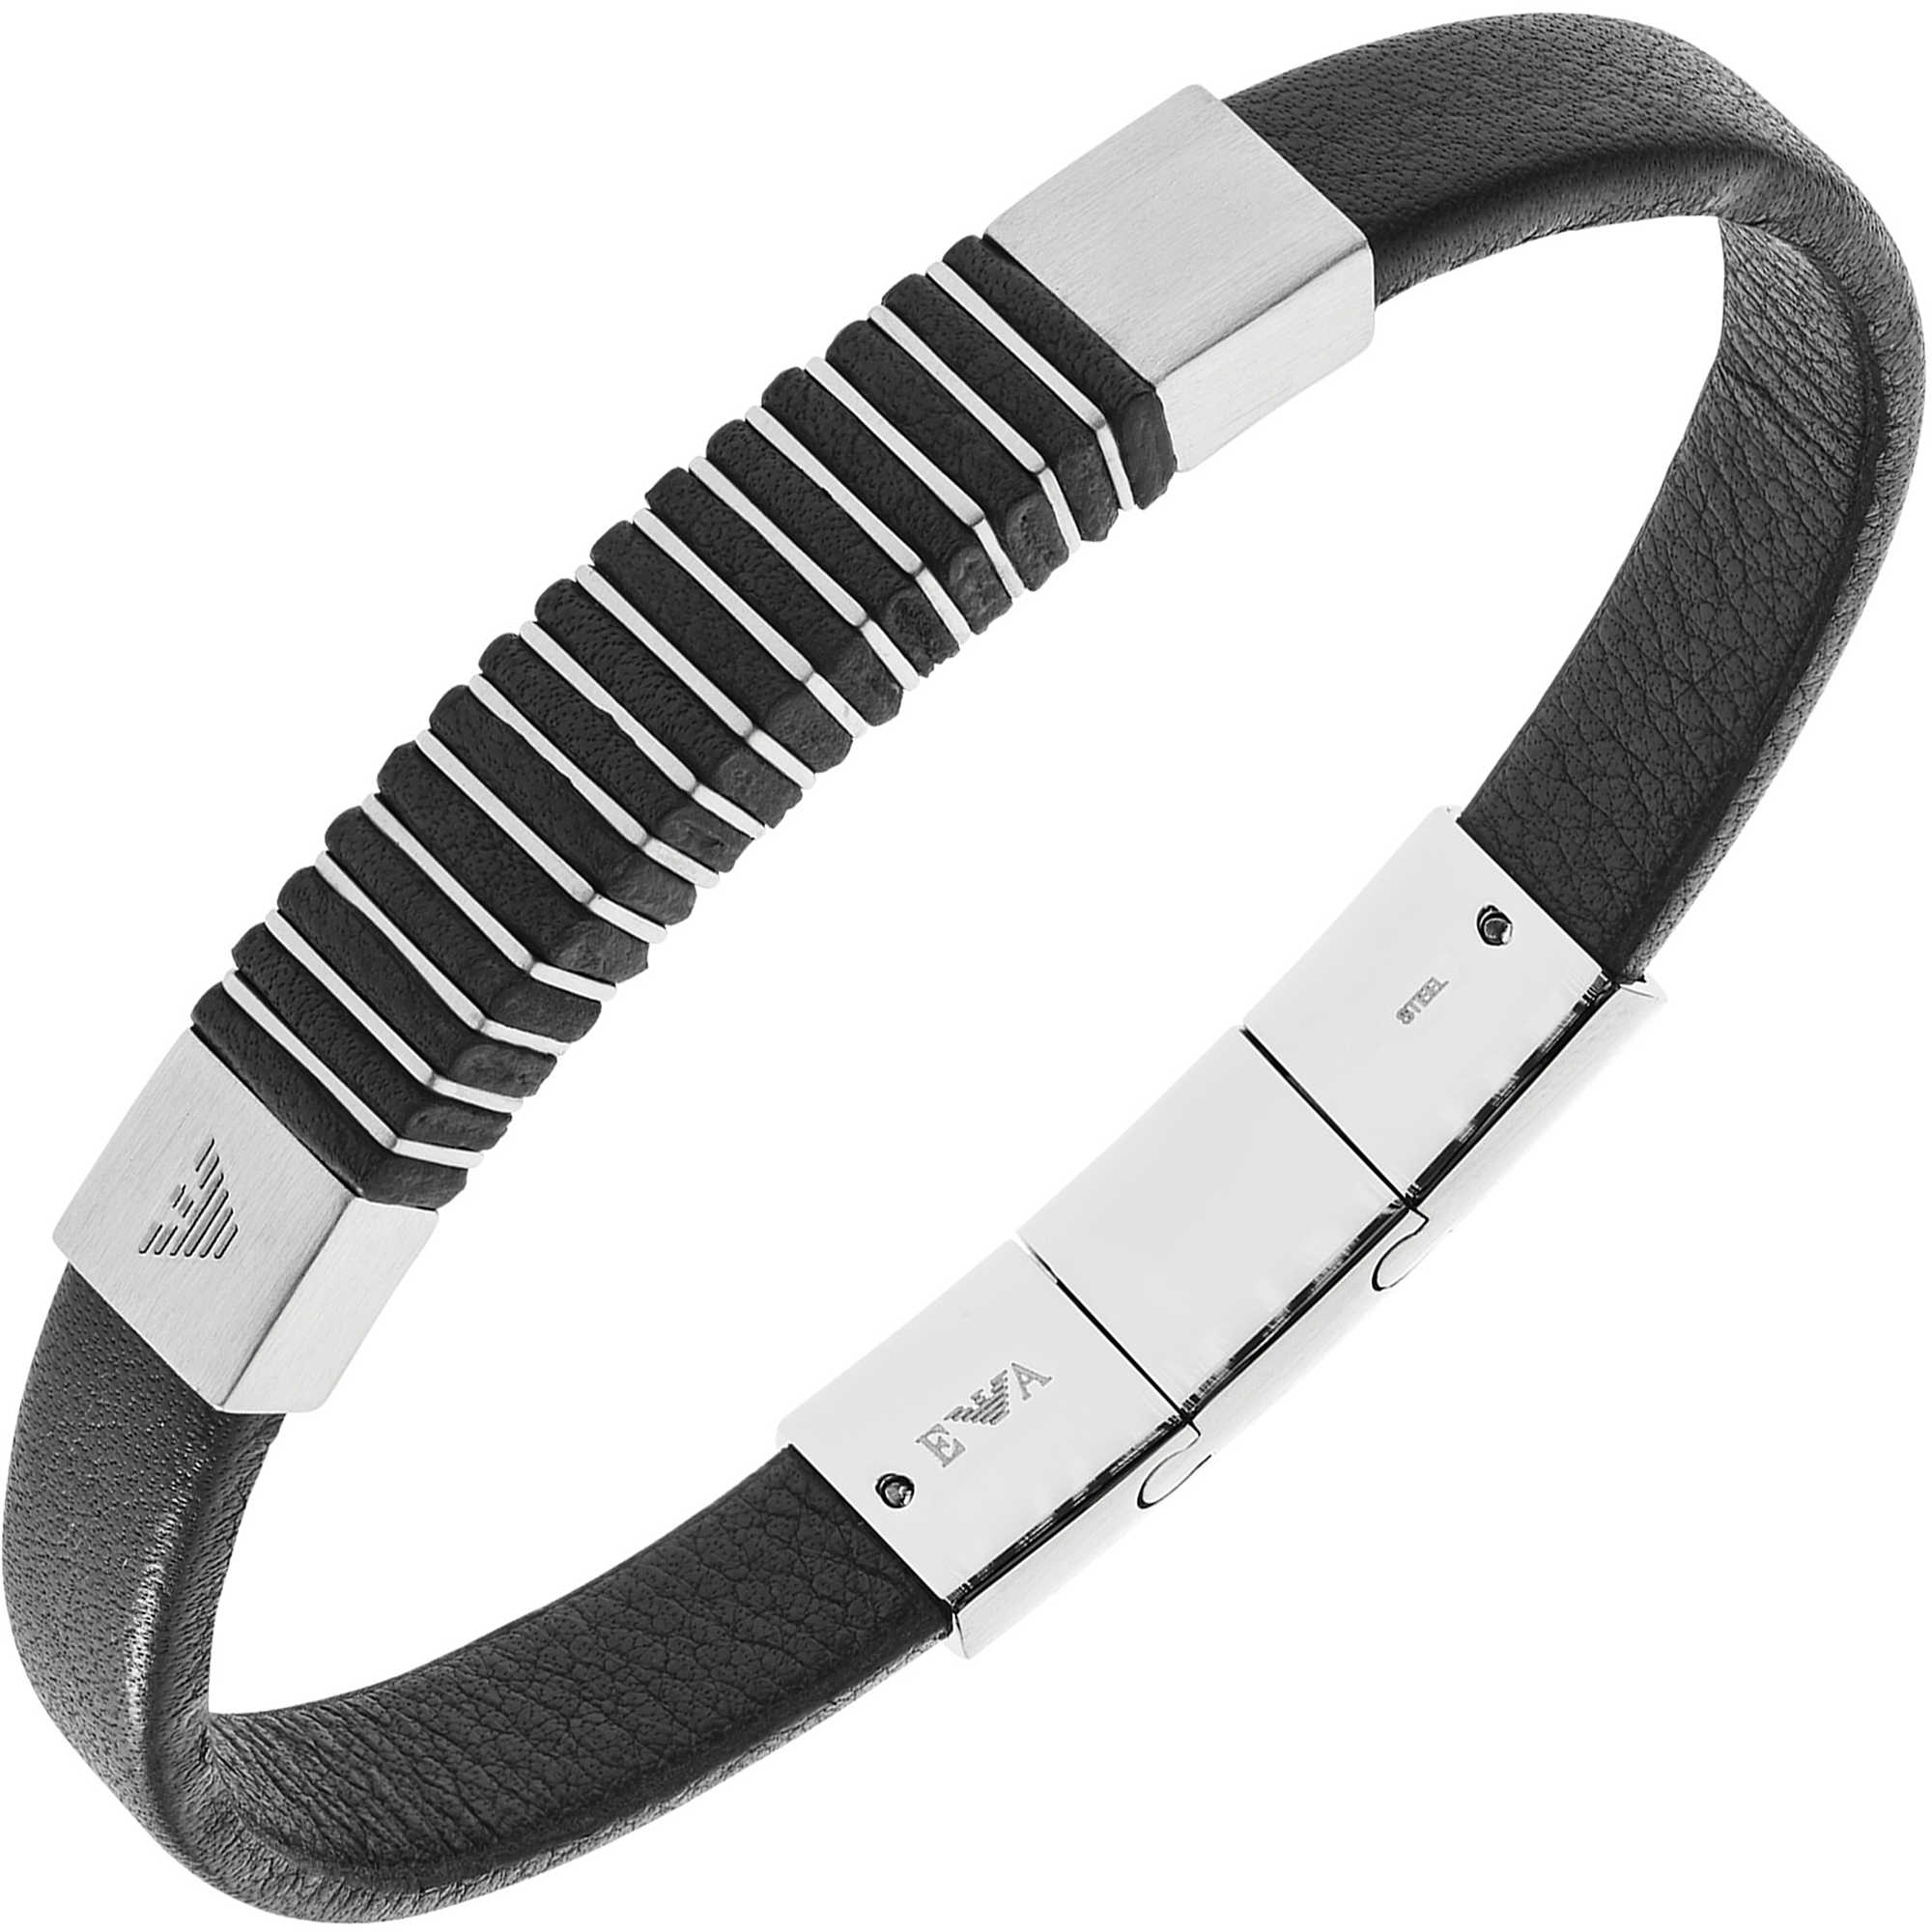 bracelet man jewellery Emporio Armani EGS2536040. zoom. package bracelets  Emporio Armani EGS2536040 59481d159f5